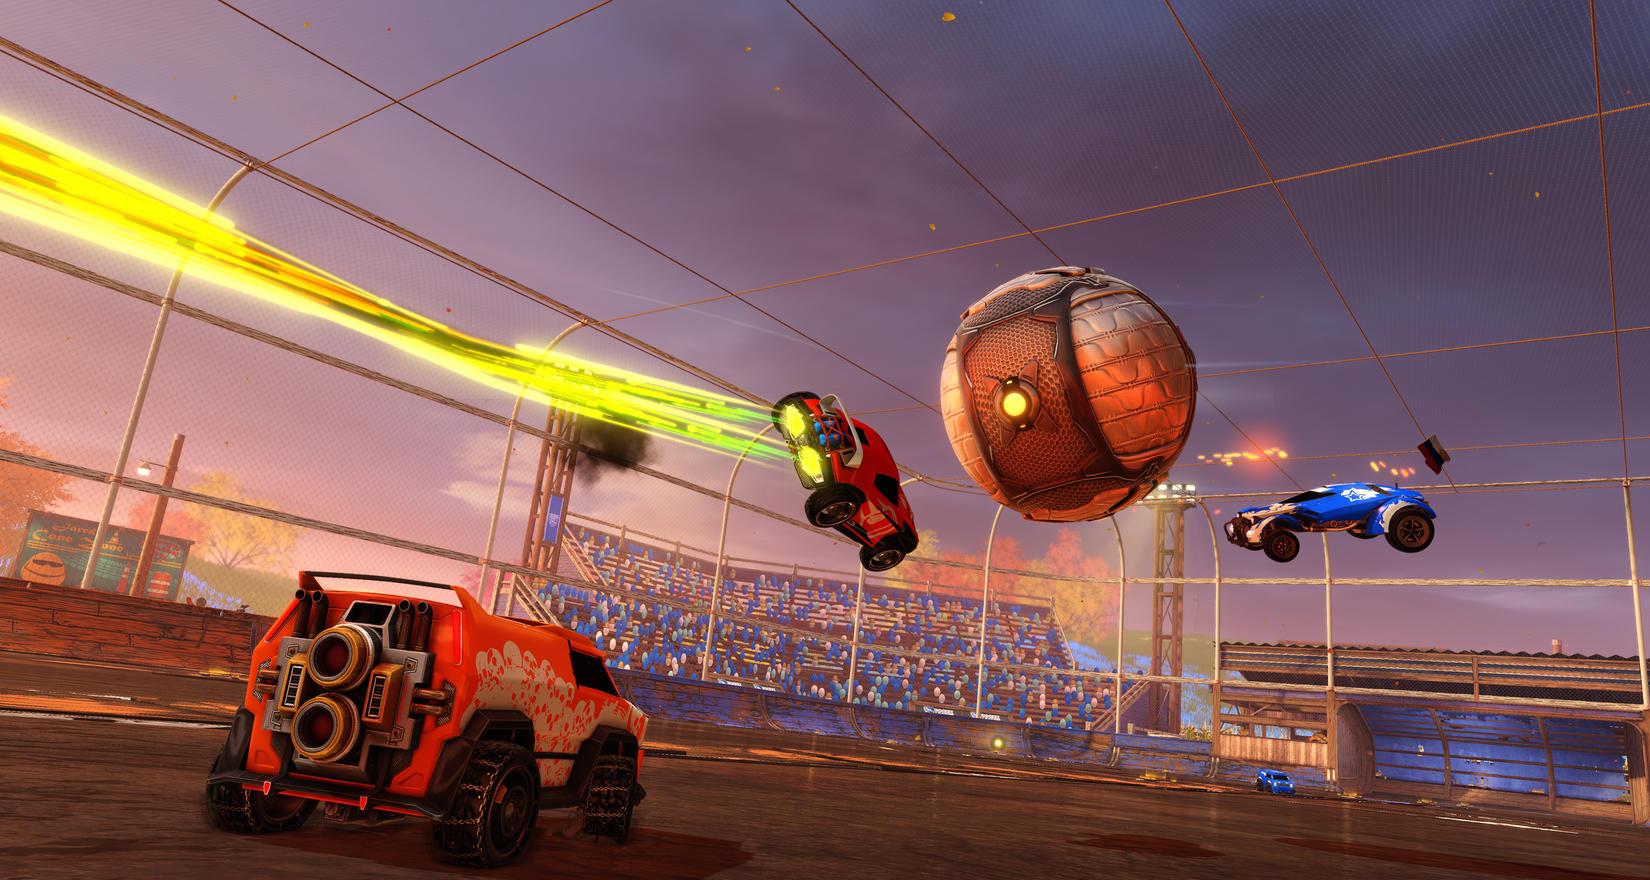 Rocket League's 'RocketID' has been delayed into 2019 | PC Gamer